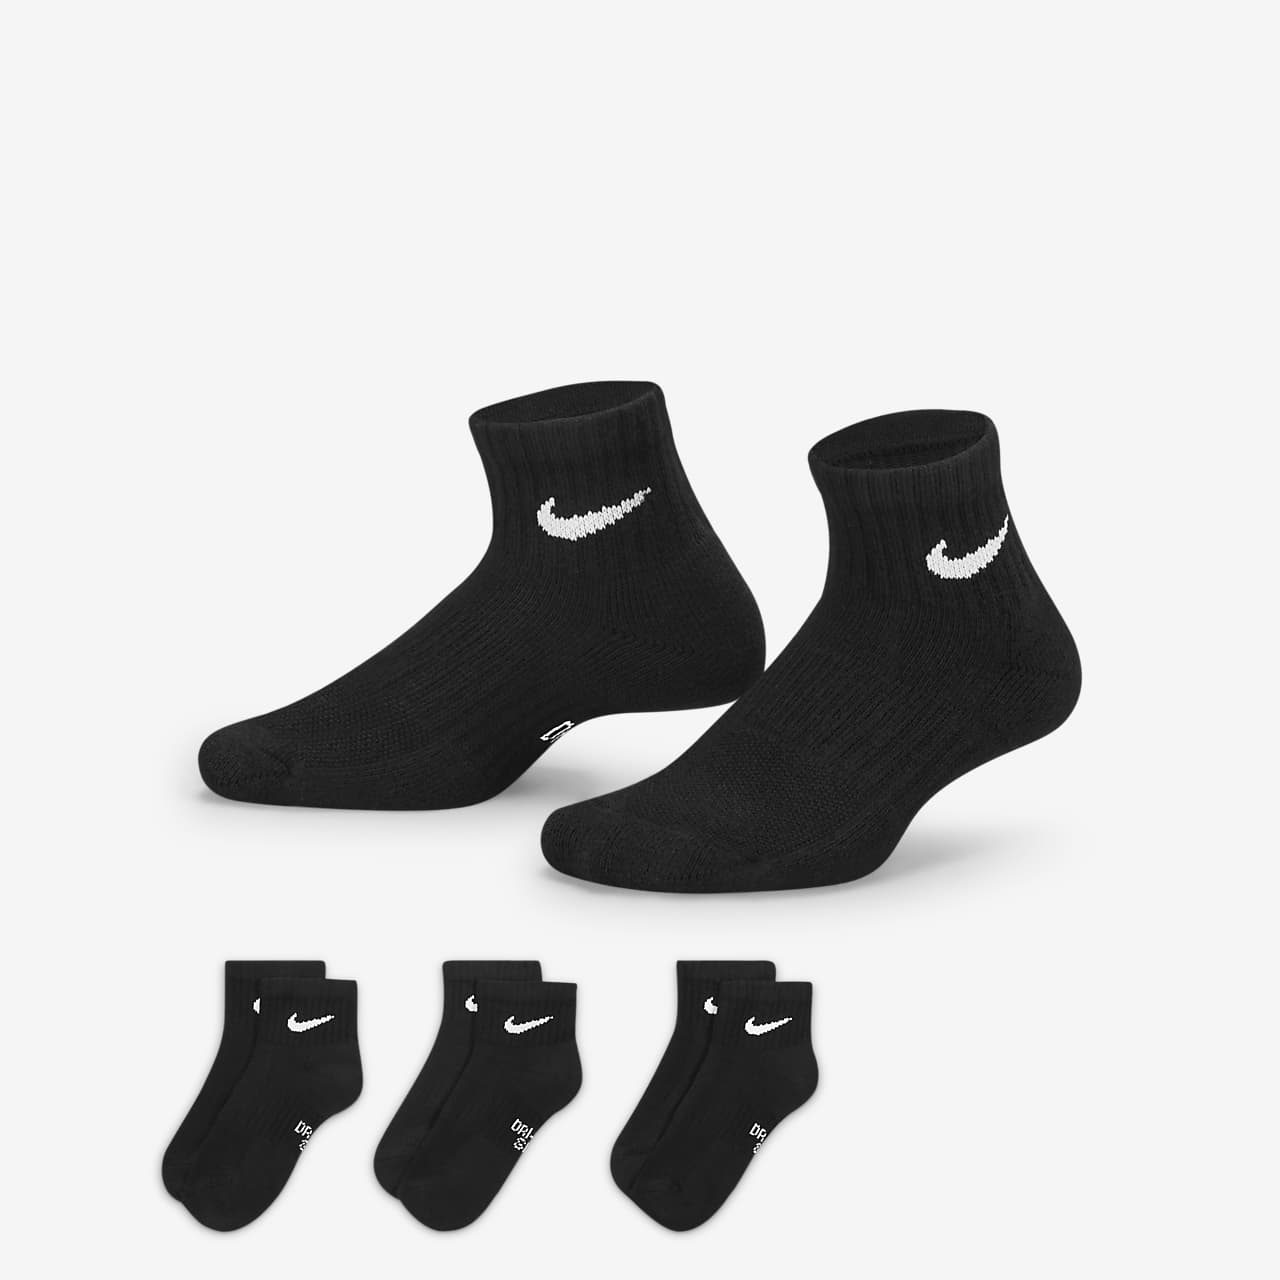 Nike Everyday Big Kids' Cushioned Ankle Socks (3 Pairs)